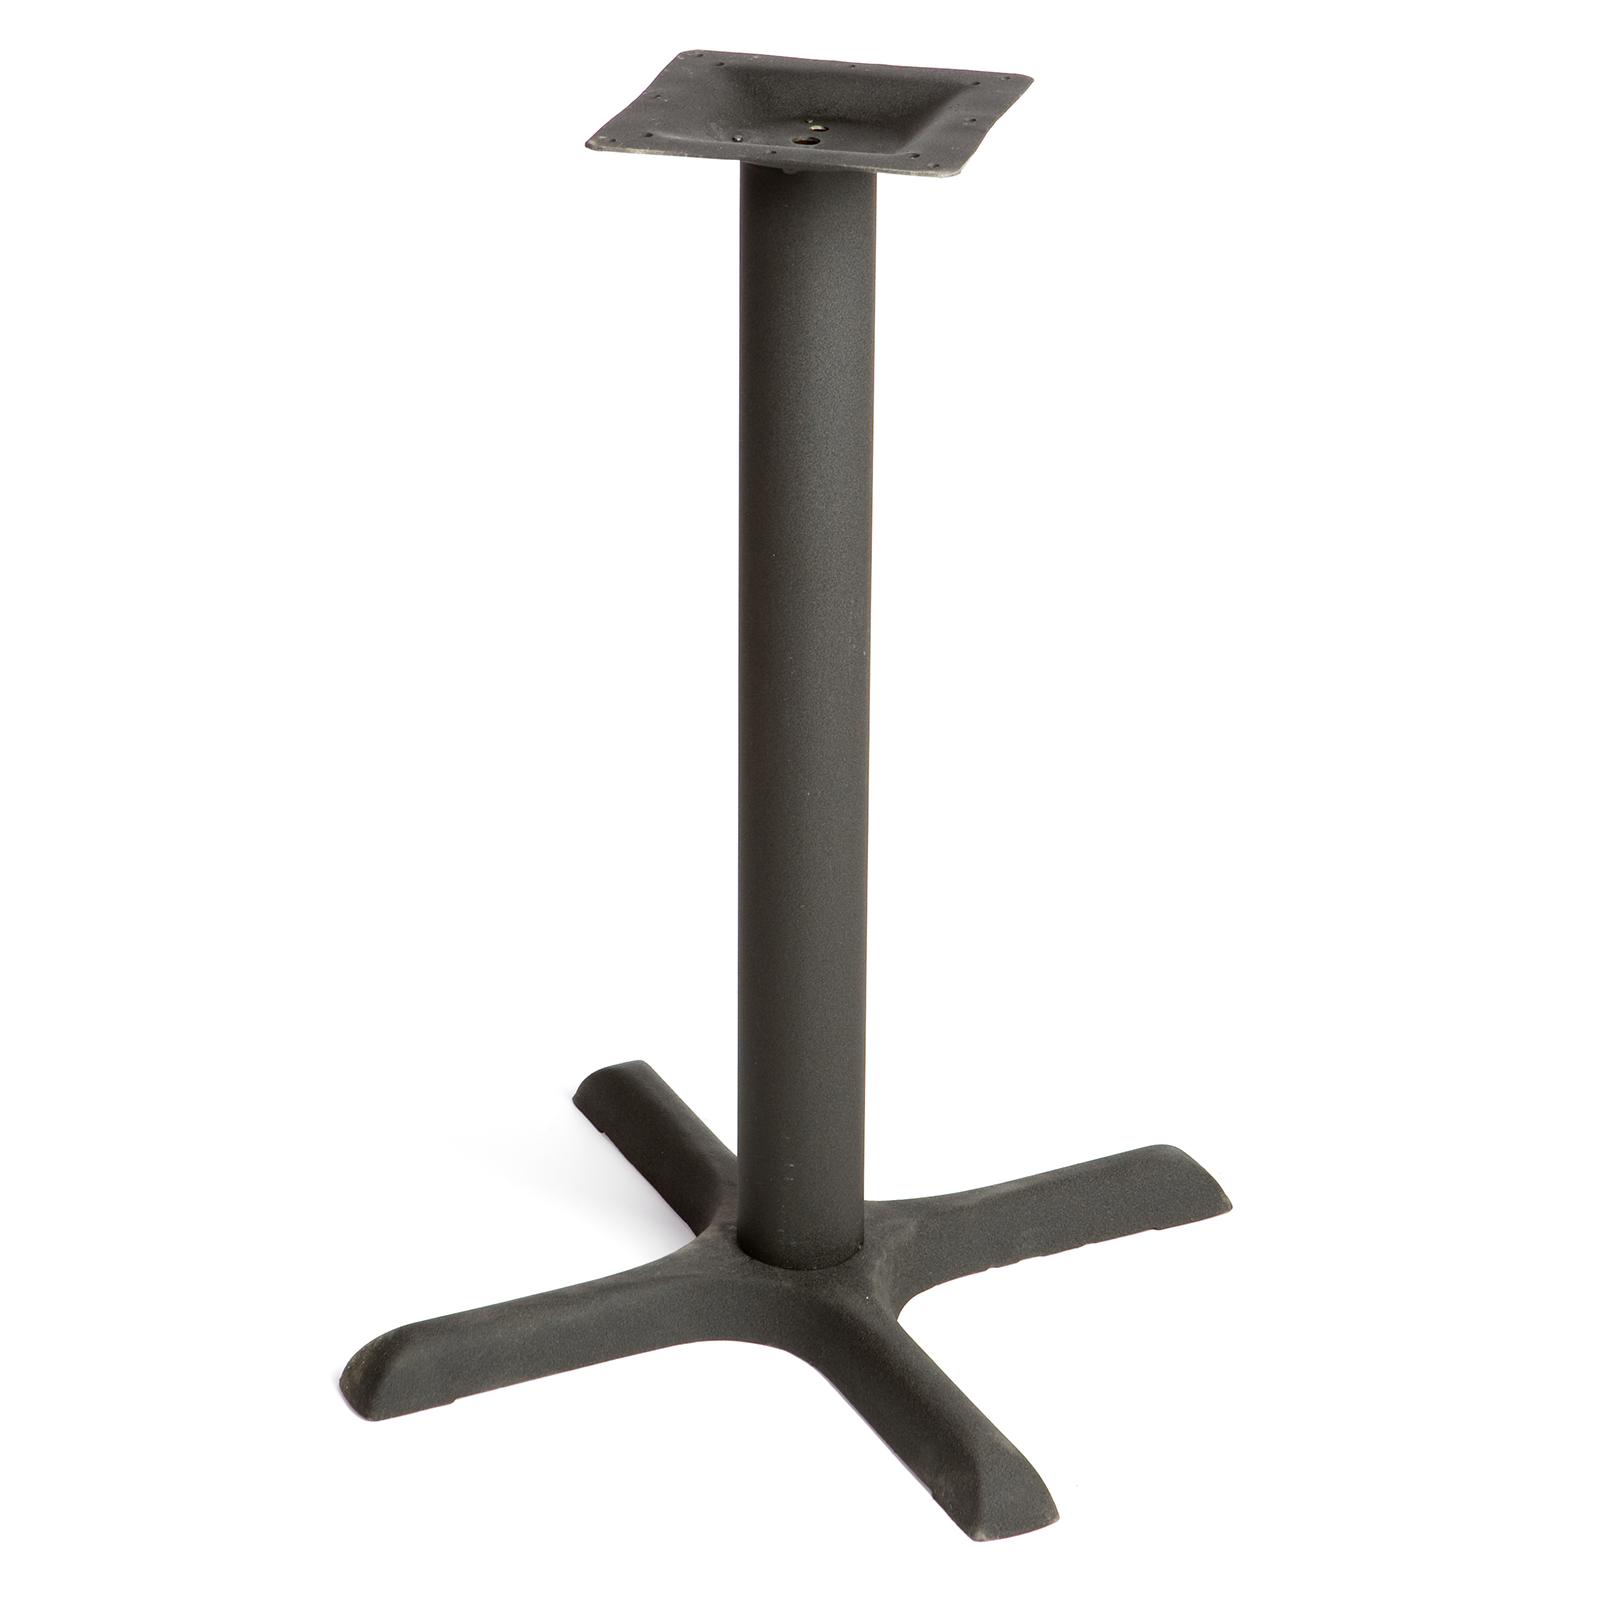 Oak Street OD-B22-STD table base, metal